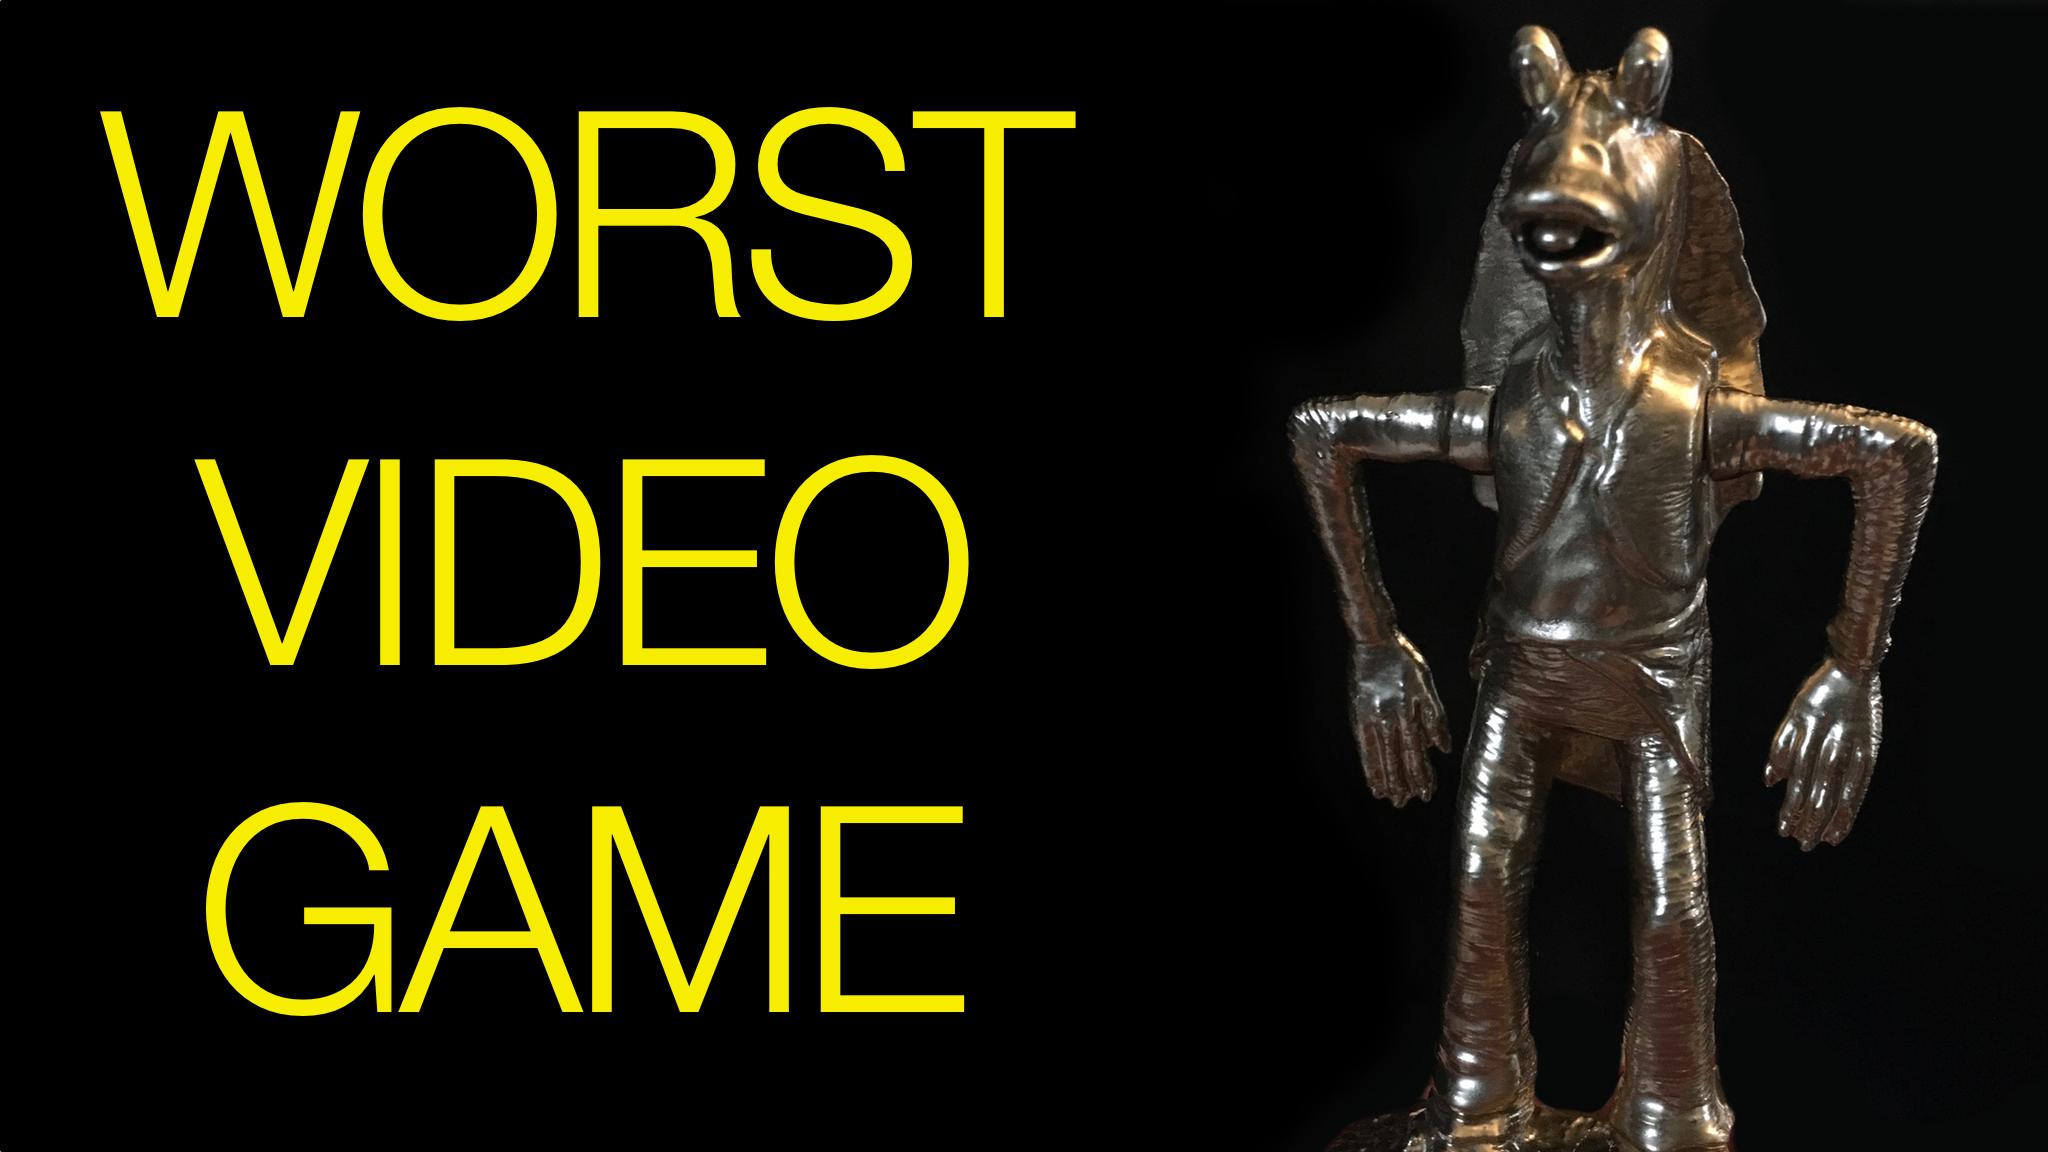 WORST VIDEO GAME 2048X1152.jpg